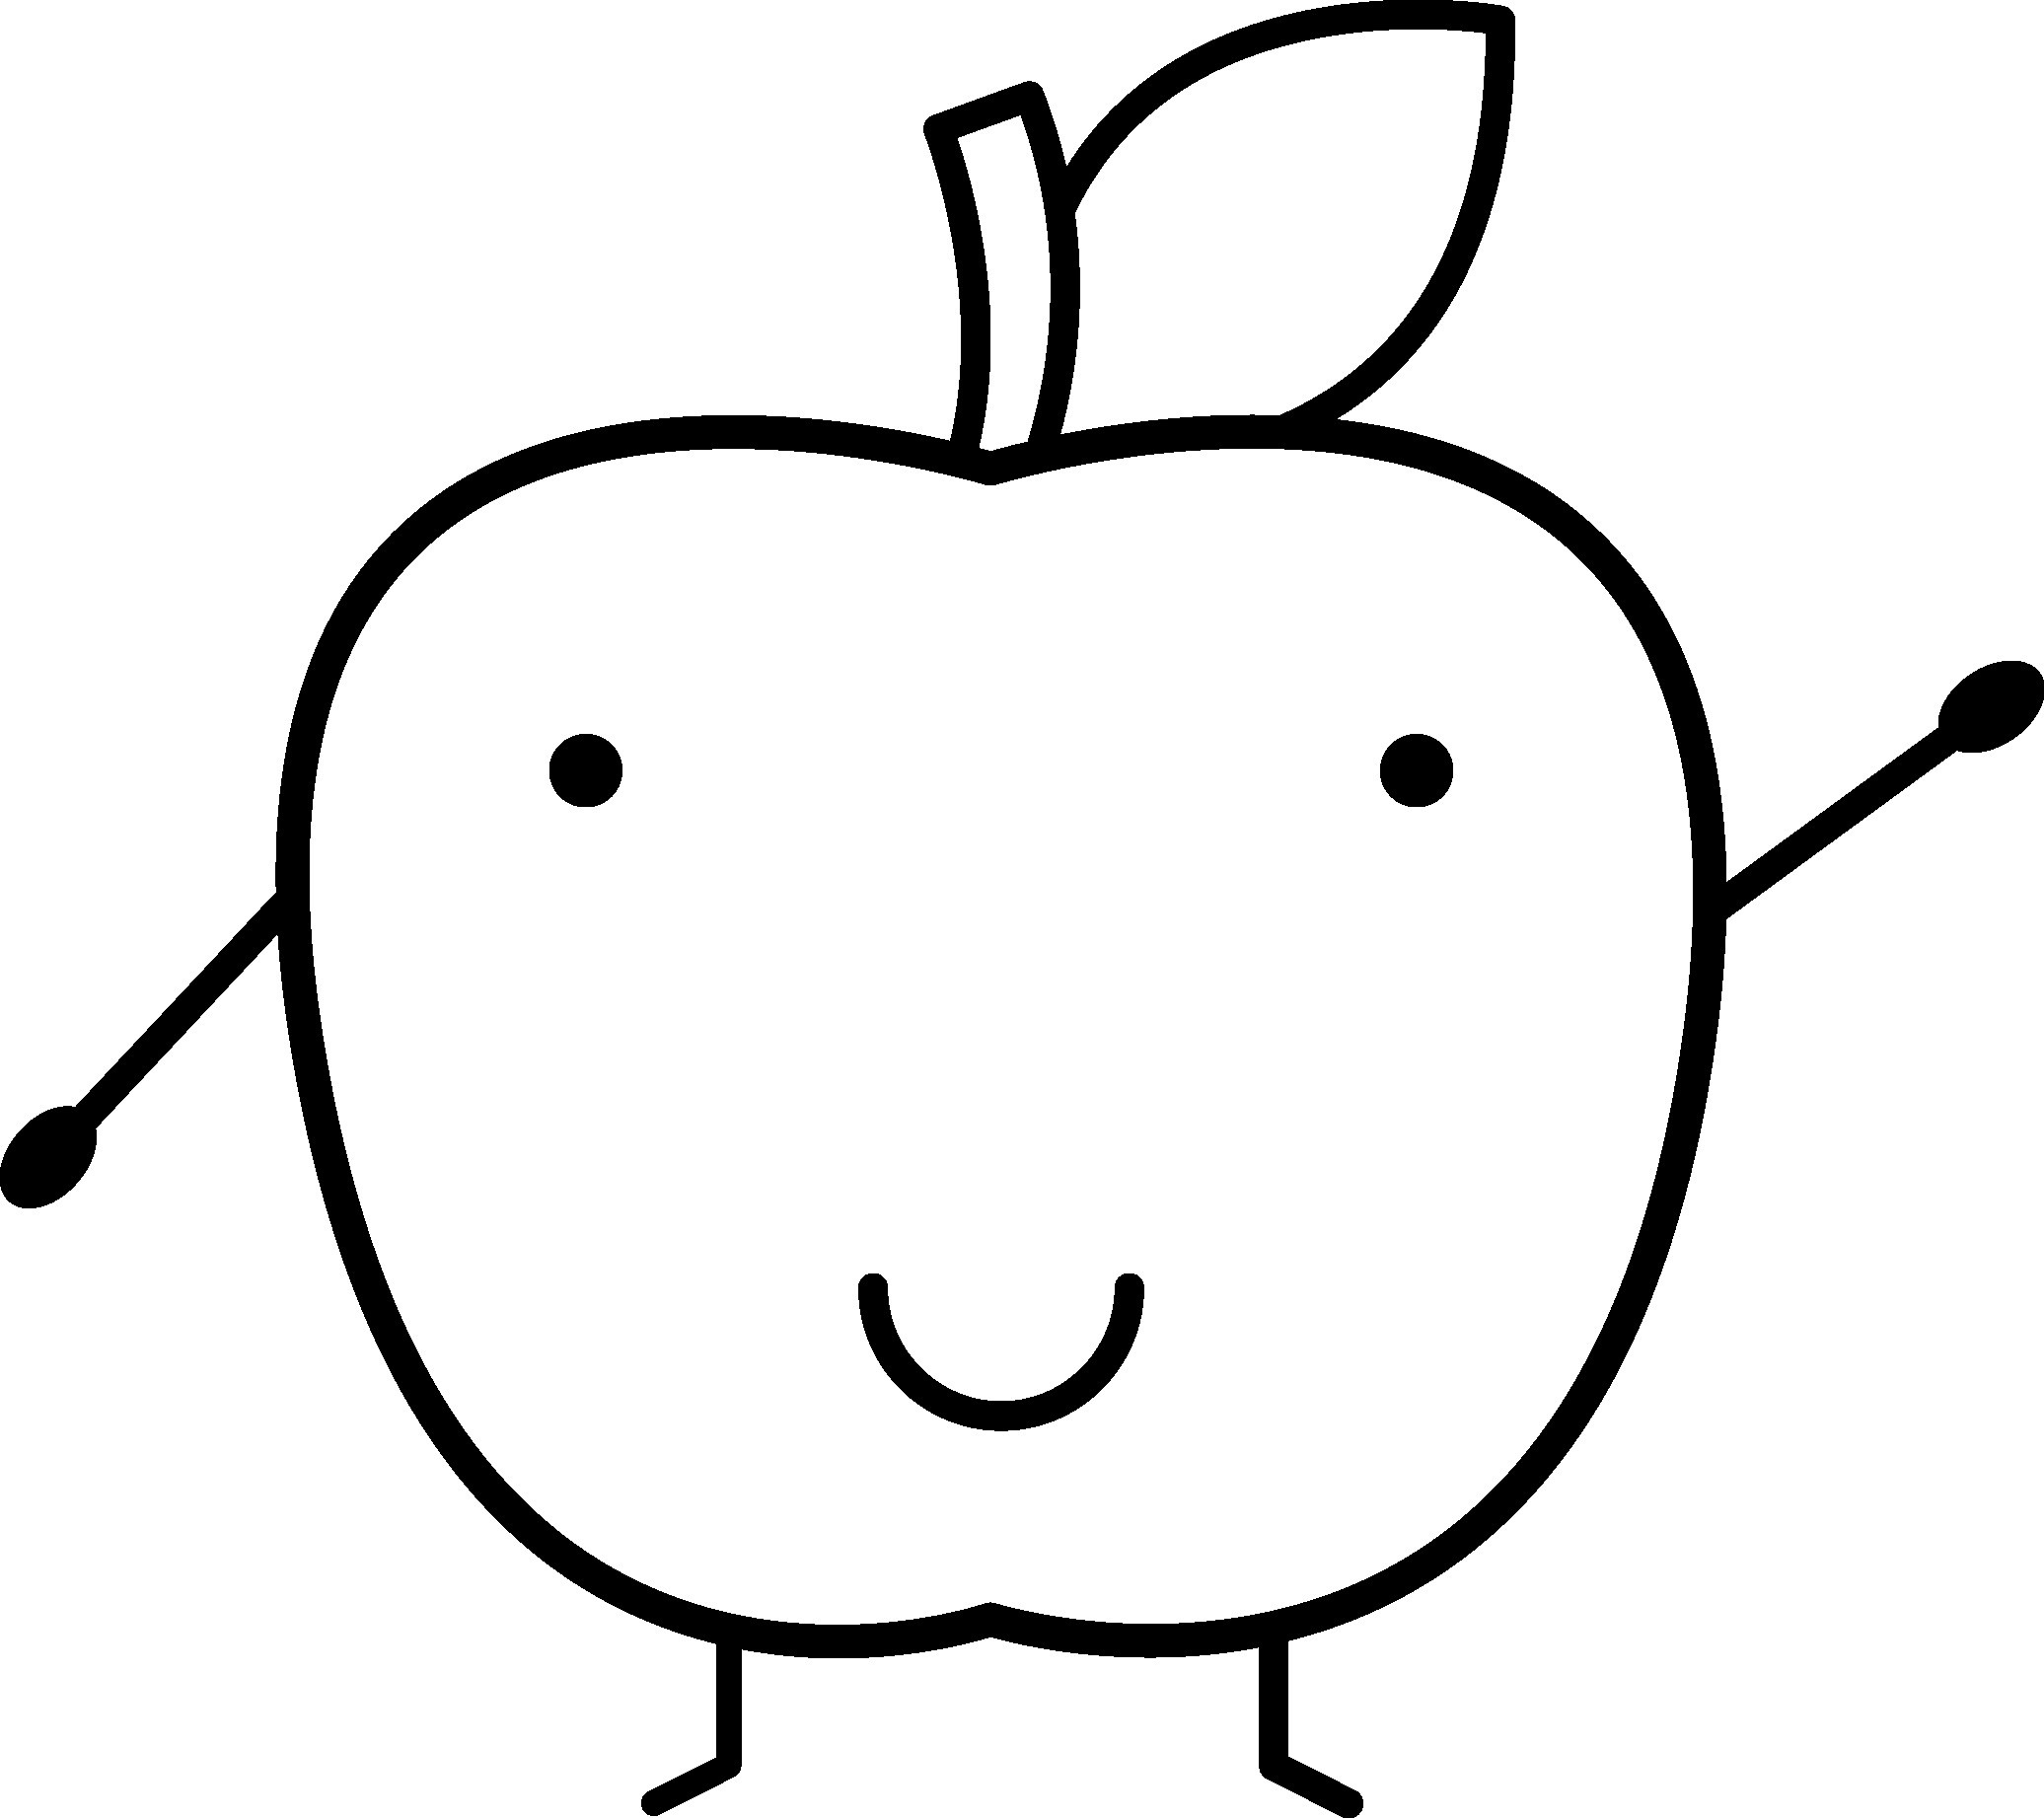 Raupe Nimmersatt Ausmalbild Neu Smiling Apple Schön Kleine Raupe Nimmersatt Ausmalbilder Bilder